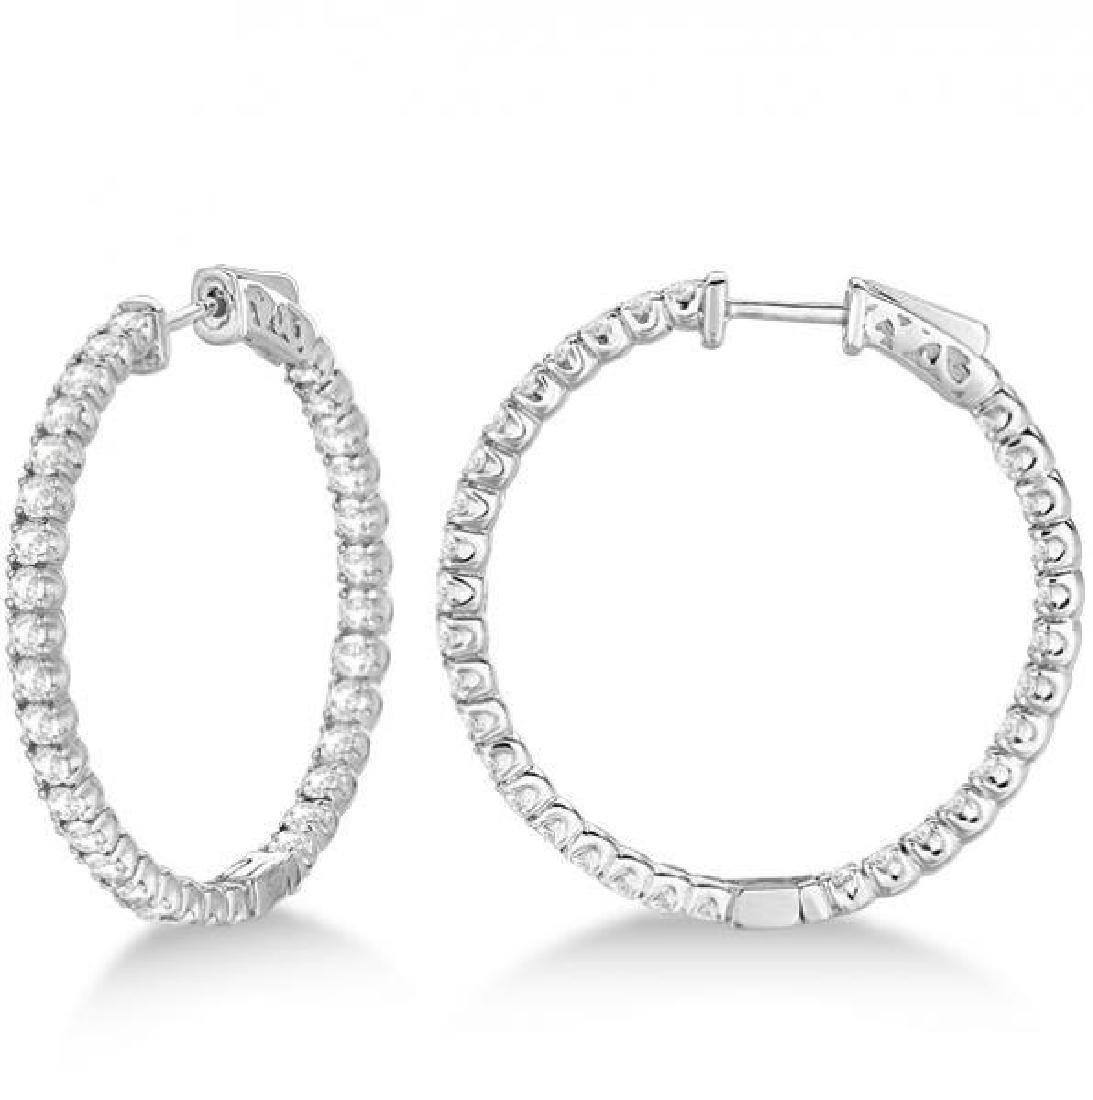 Large Round Diamond Hoop Earrings 14k White Gold (3.25c